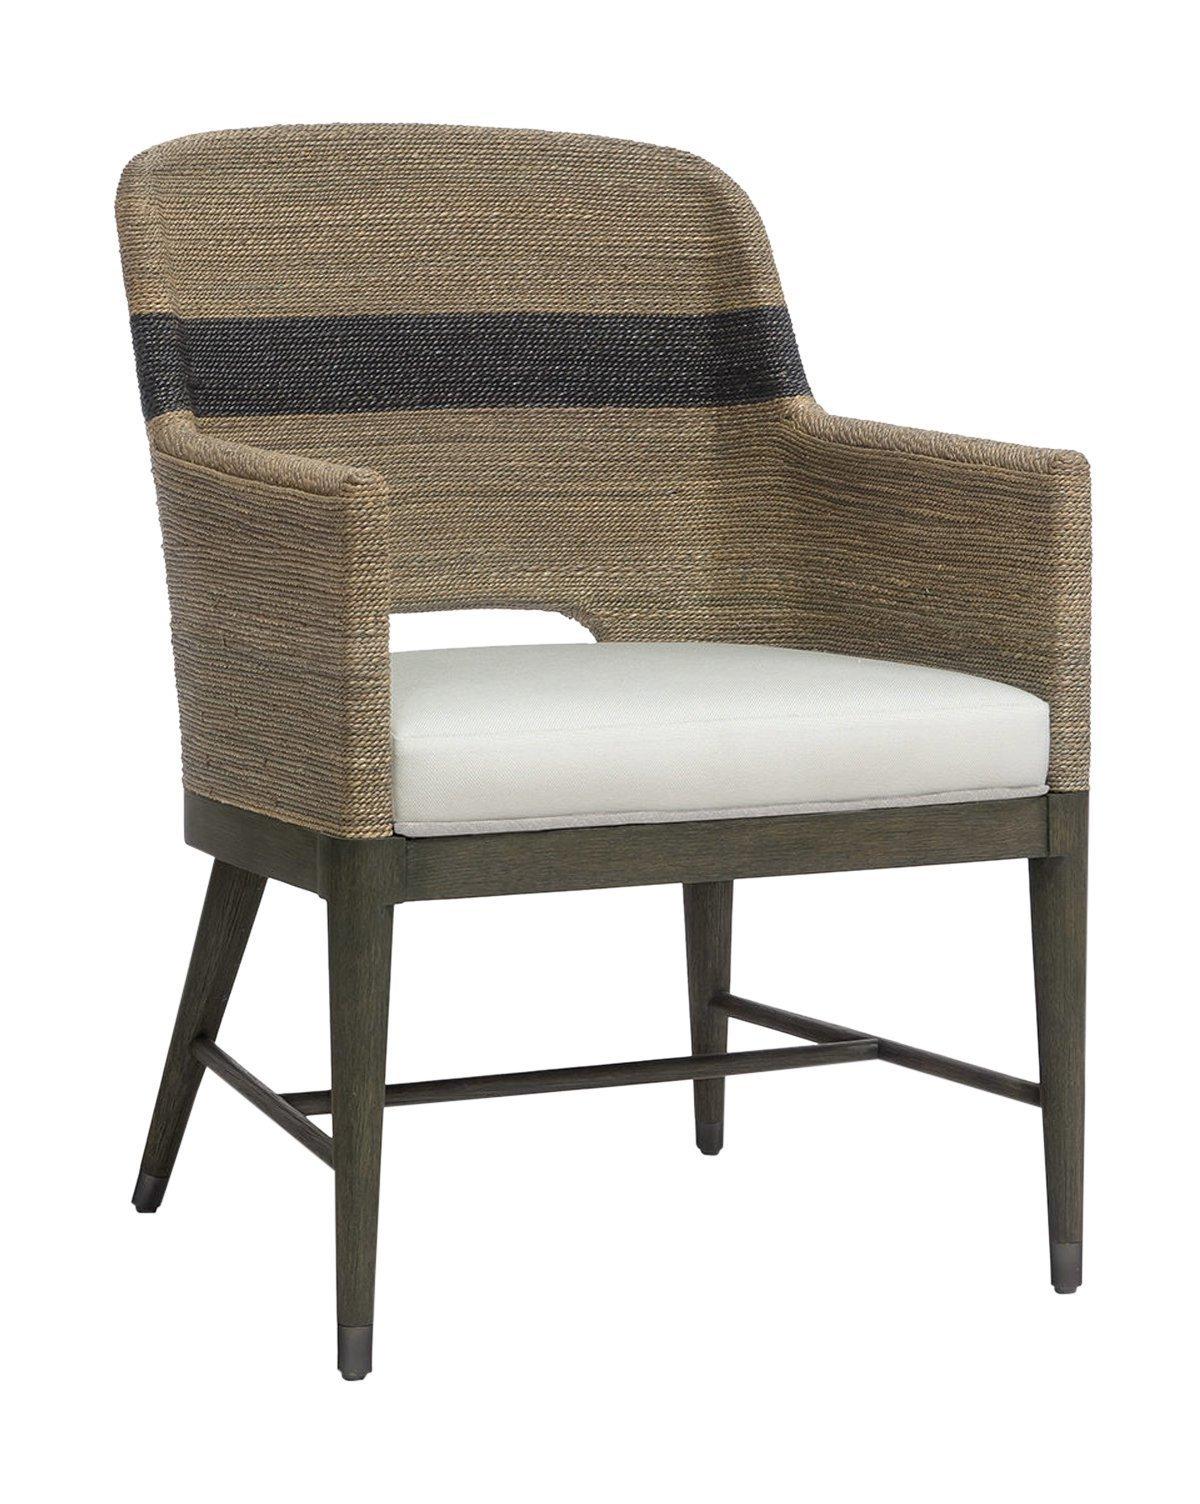 Frankie_Arm_Dining_Chair_1_copy.jpg